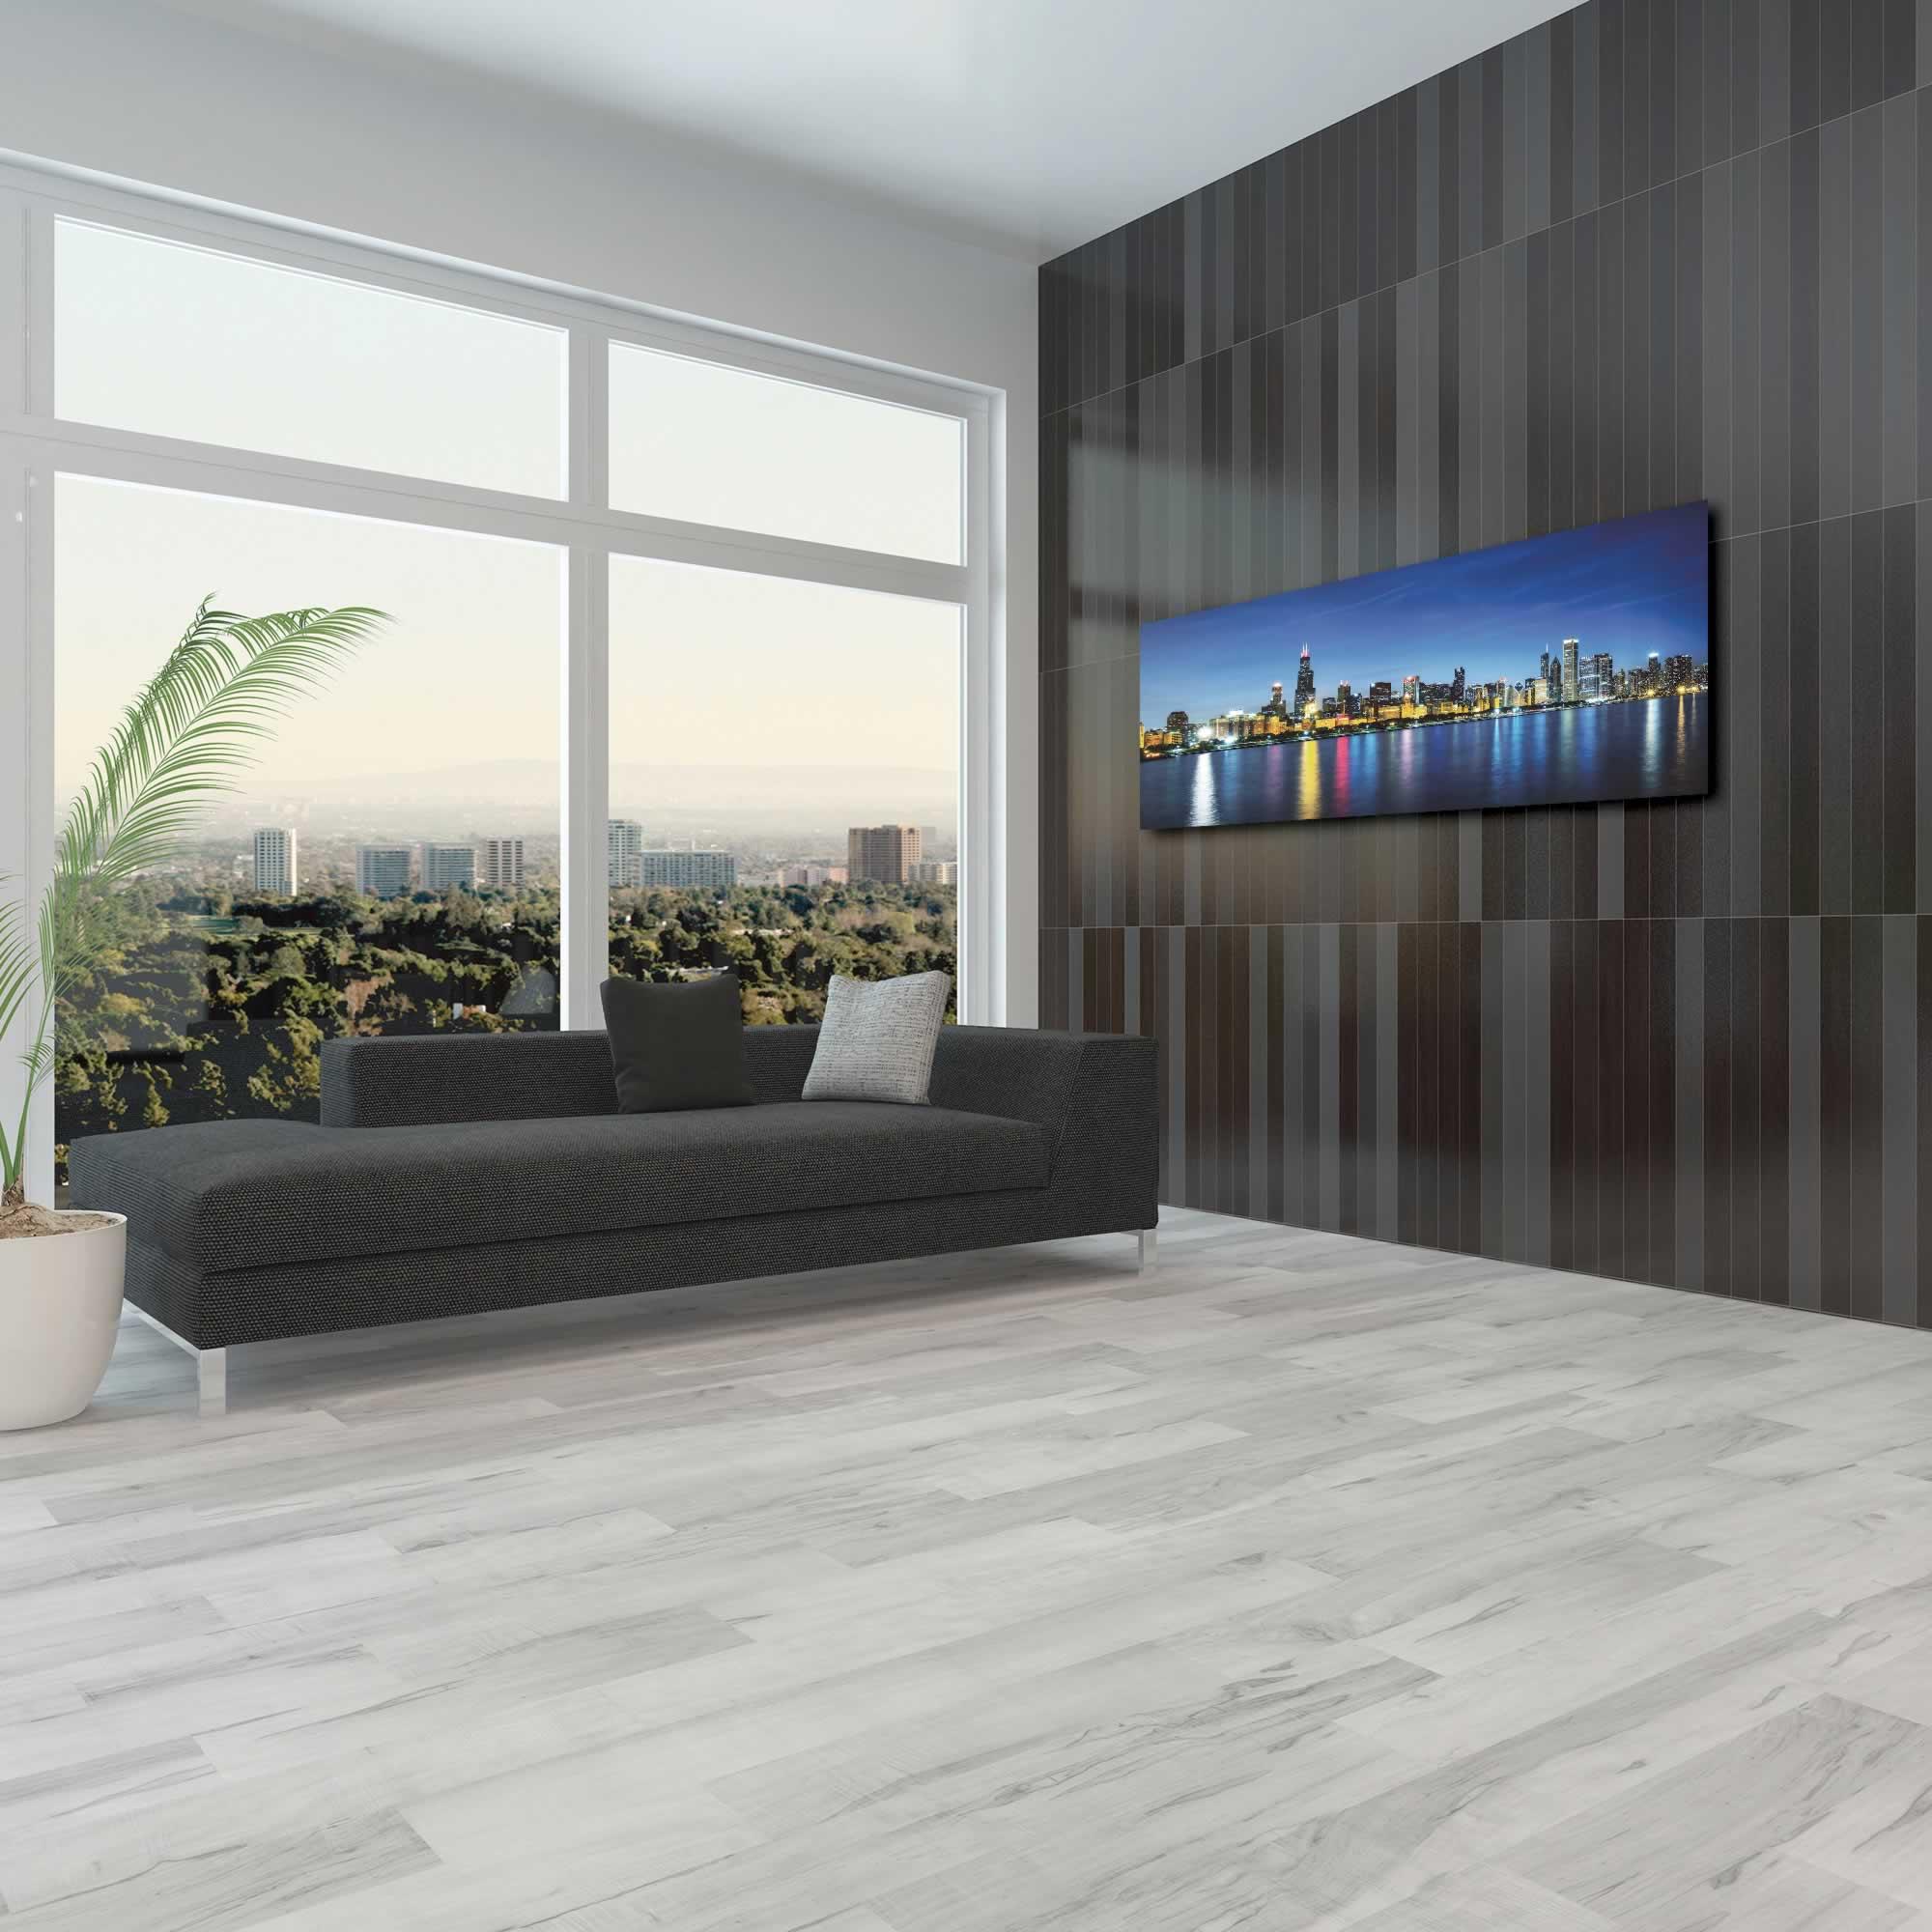 Chicago City Skyline - Urban Modern Art, Designer Home Decor, Cityscape Wall Artwork, Trendy Contemporary Art - Alternate View 3